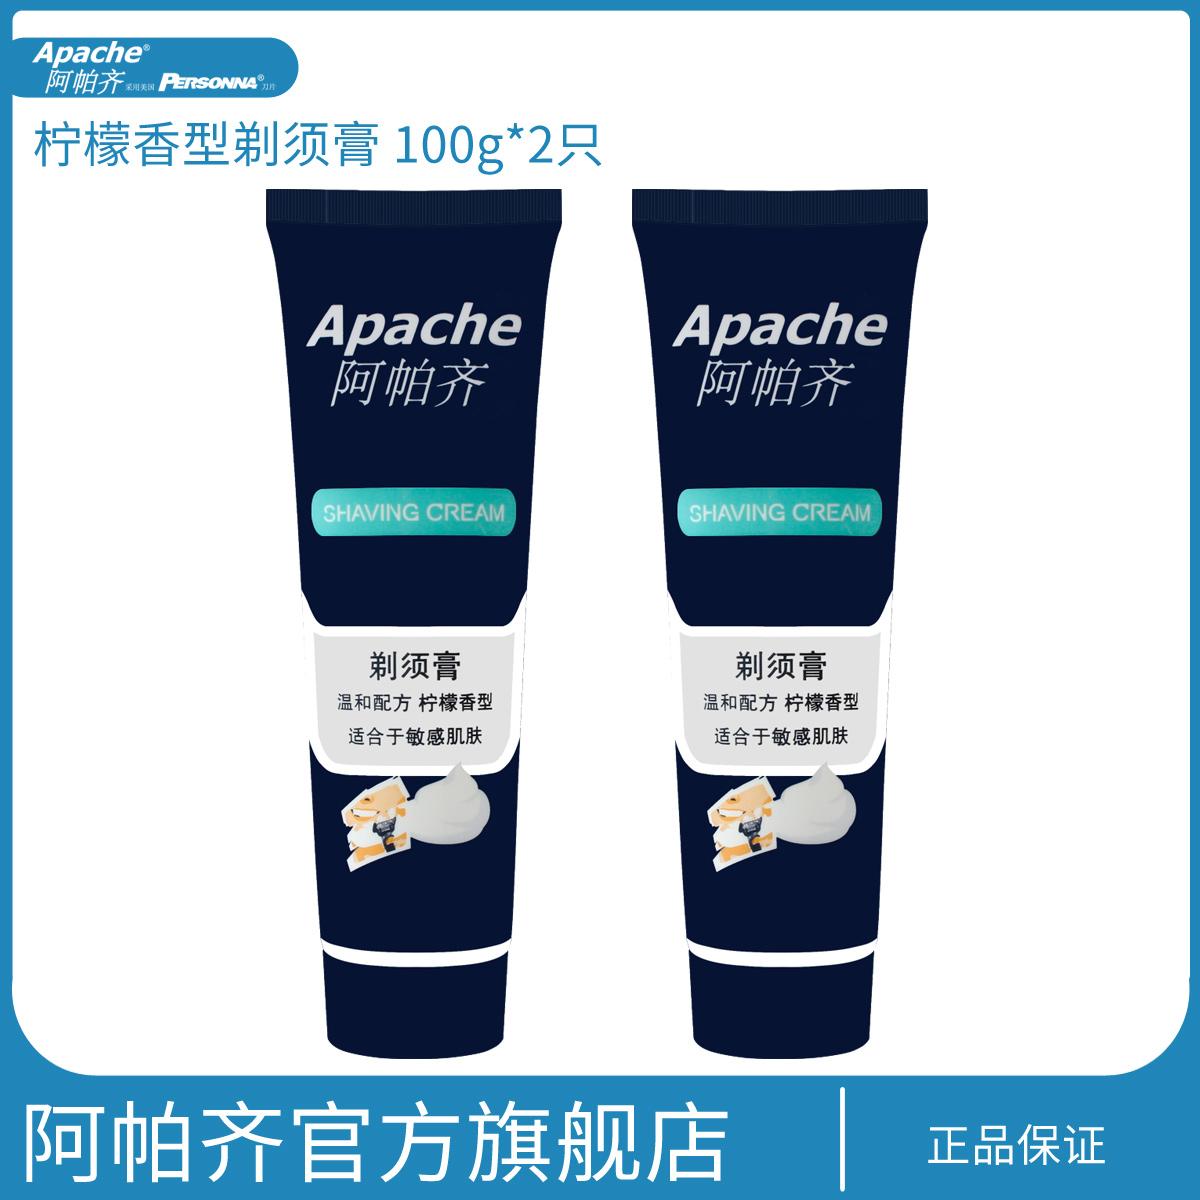 Apache阿帕齐 柠檬香型剃须泡沫膏 剃须膏 刮胡泡沫膏2支共200克